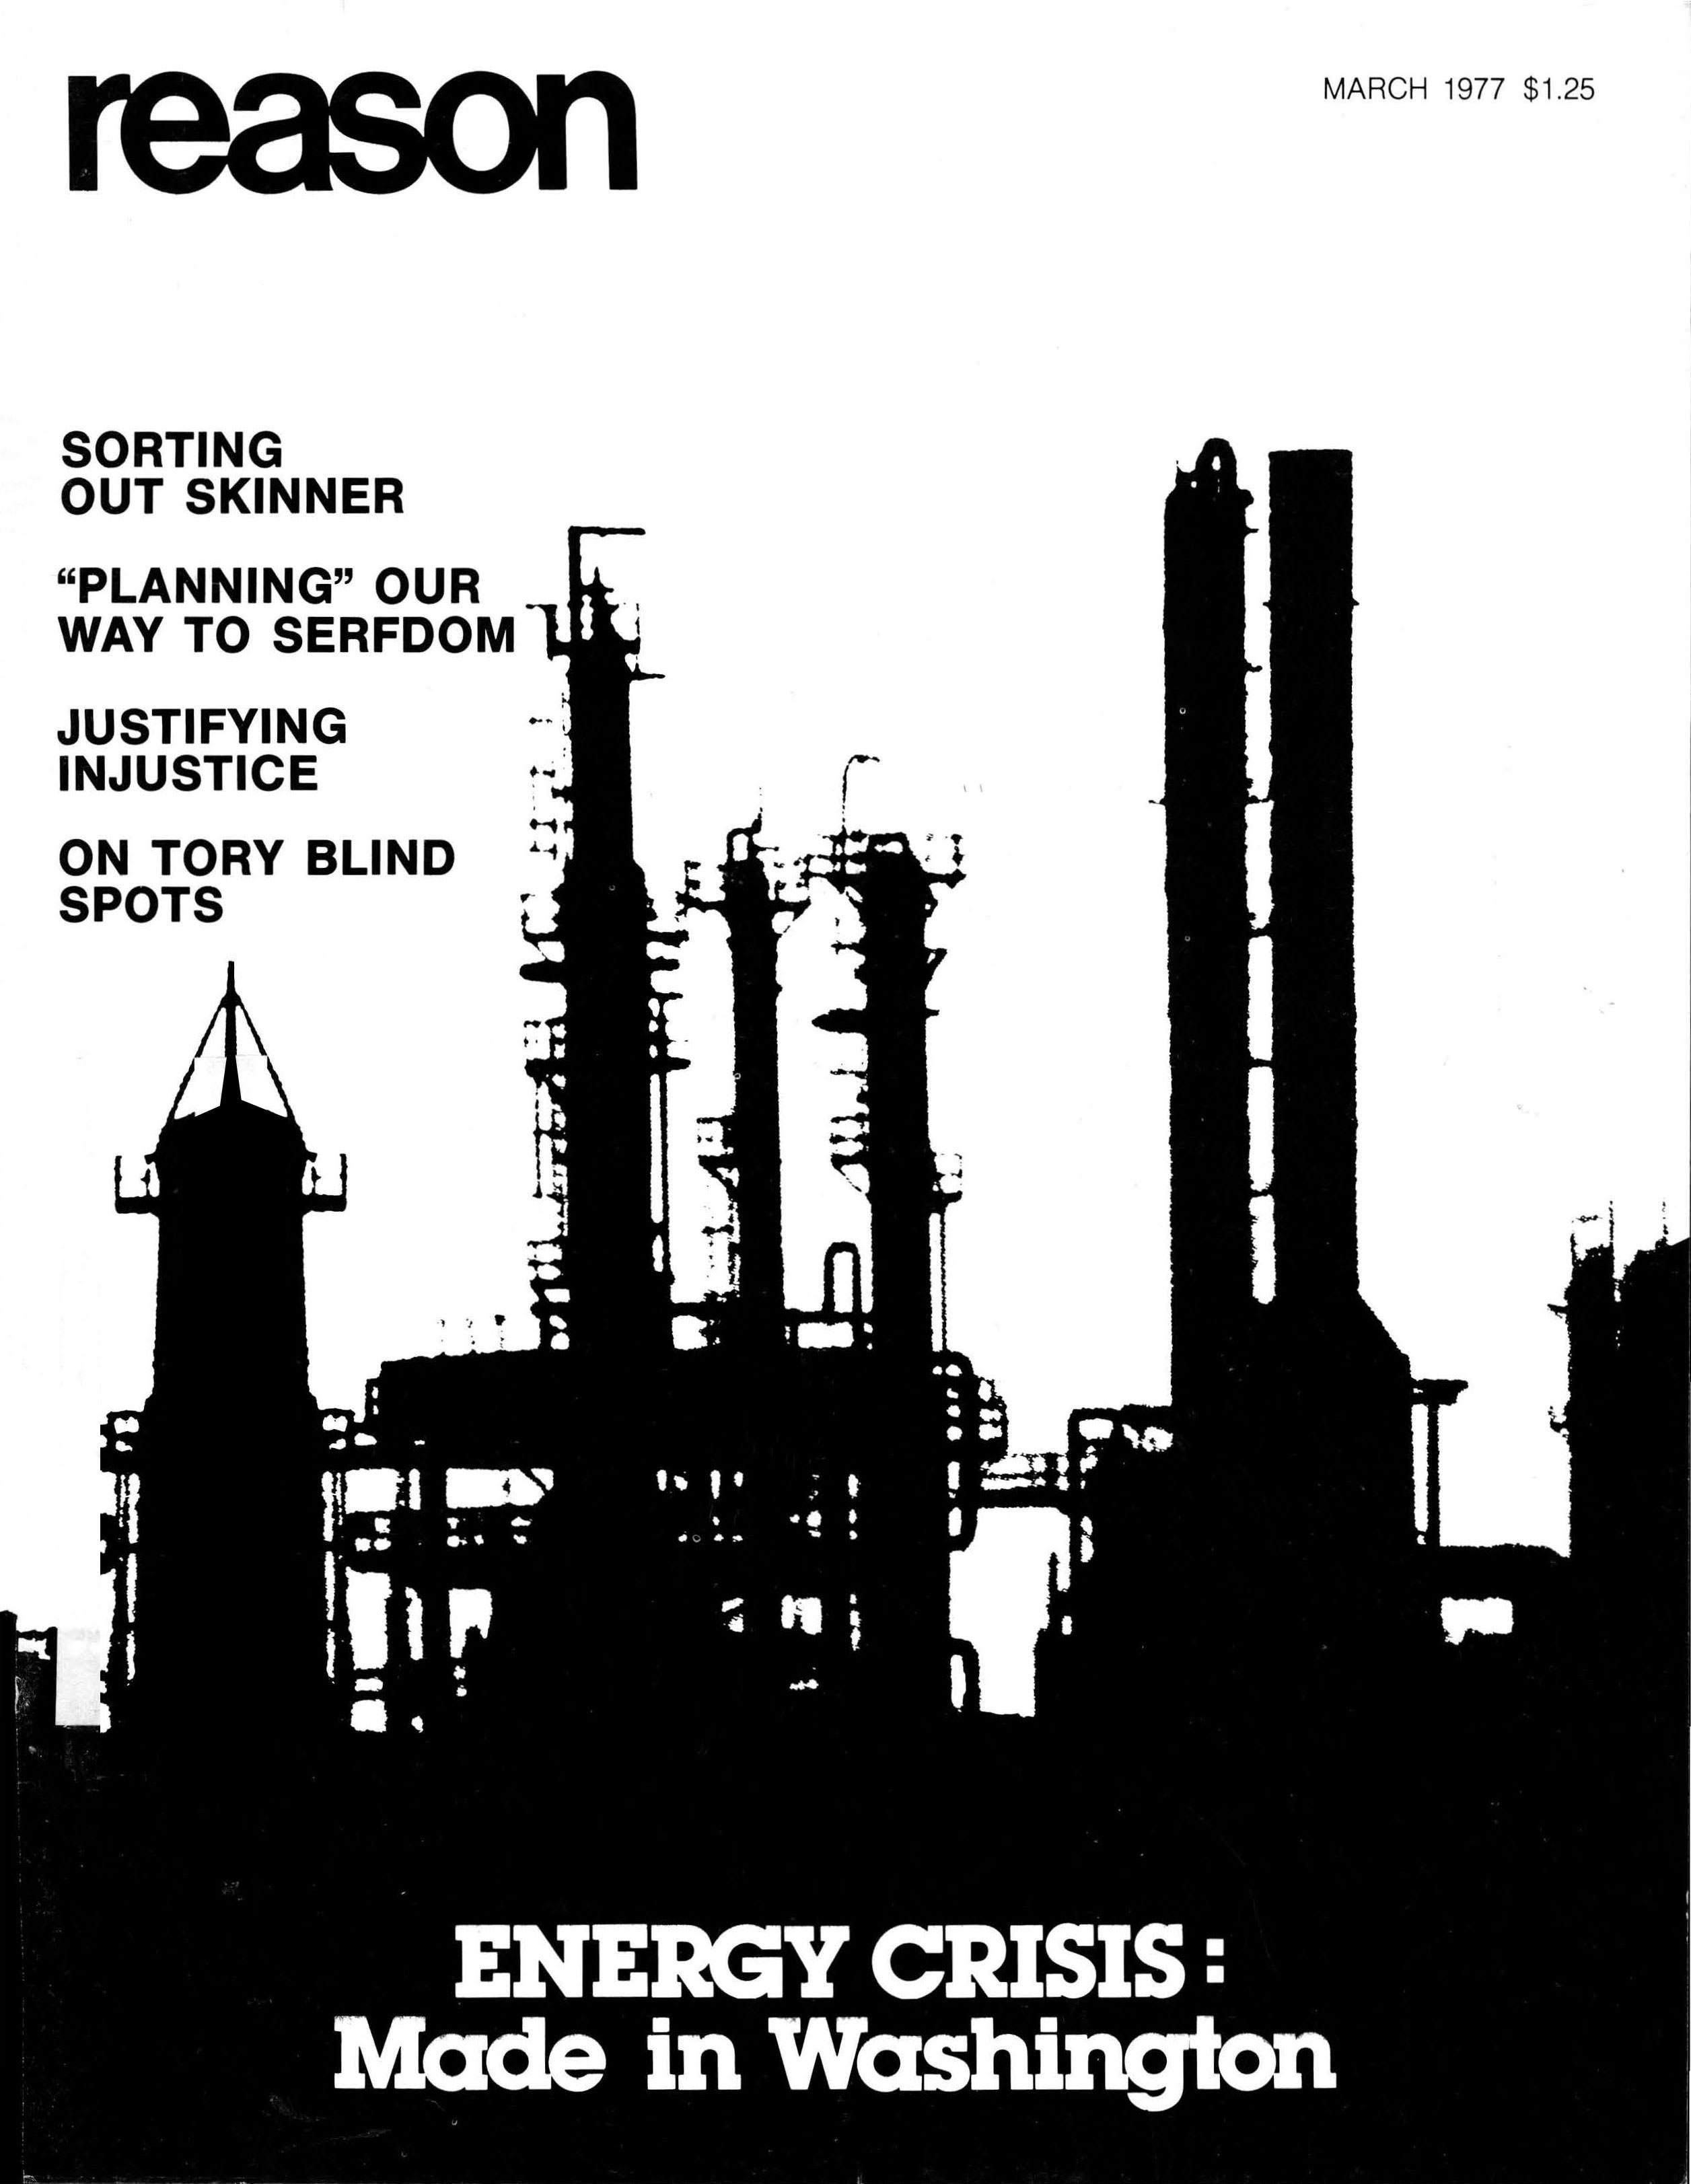 Reason Magazine, March 1977 cover image